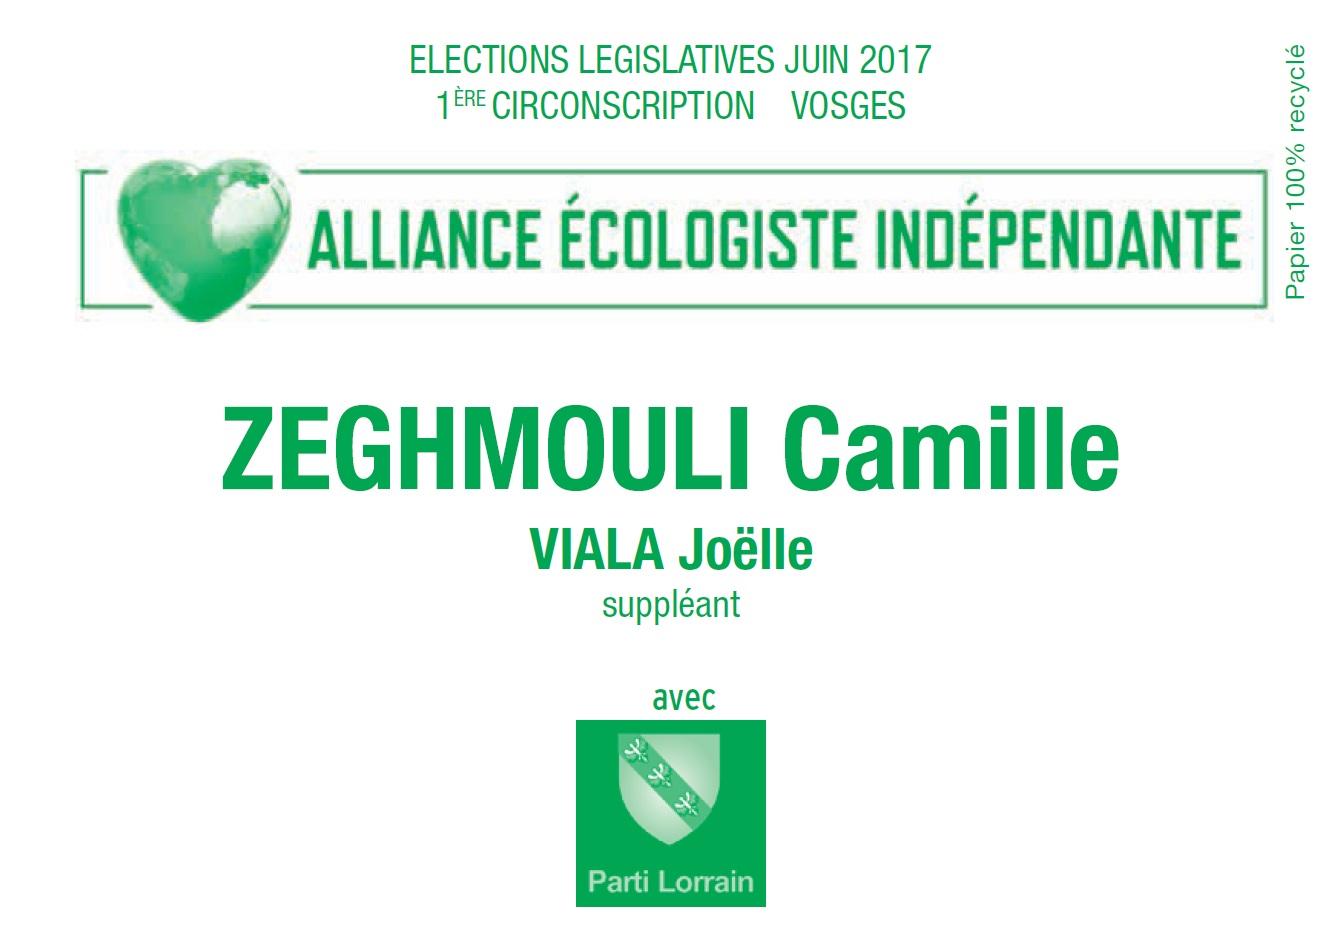 Bulletin de vote camille zeghmouli 1ere circo vosges